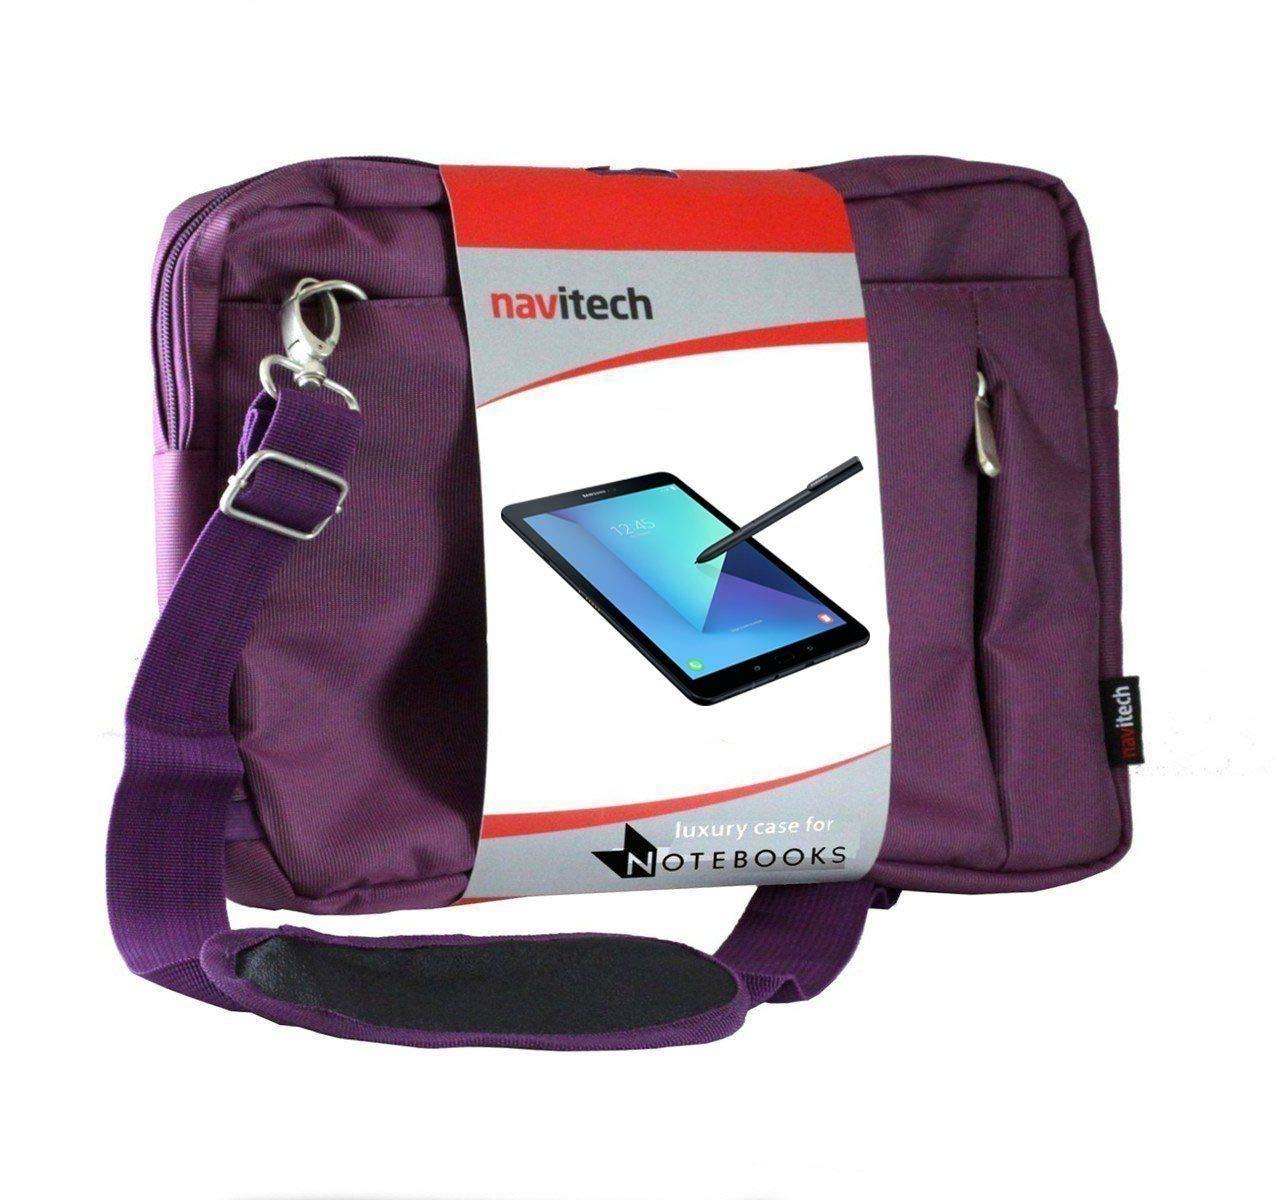 Navitech Purple Sleek Premium Water Resistant Shock Absorbent Carry Bag Case Compatible with The LG G Pad F 8.0 | LG G Pad V495 | LG G Pad X 8.0 V520 | LG GPad X2 8.0 Plus V530 | LG G Pad V400